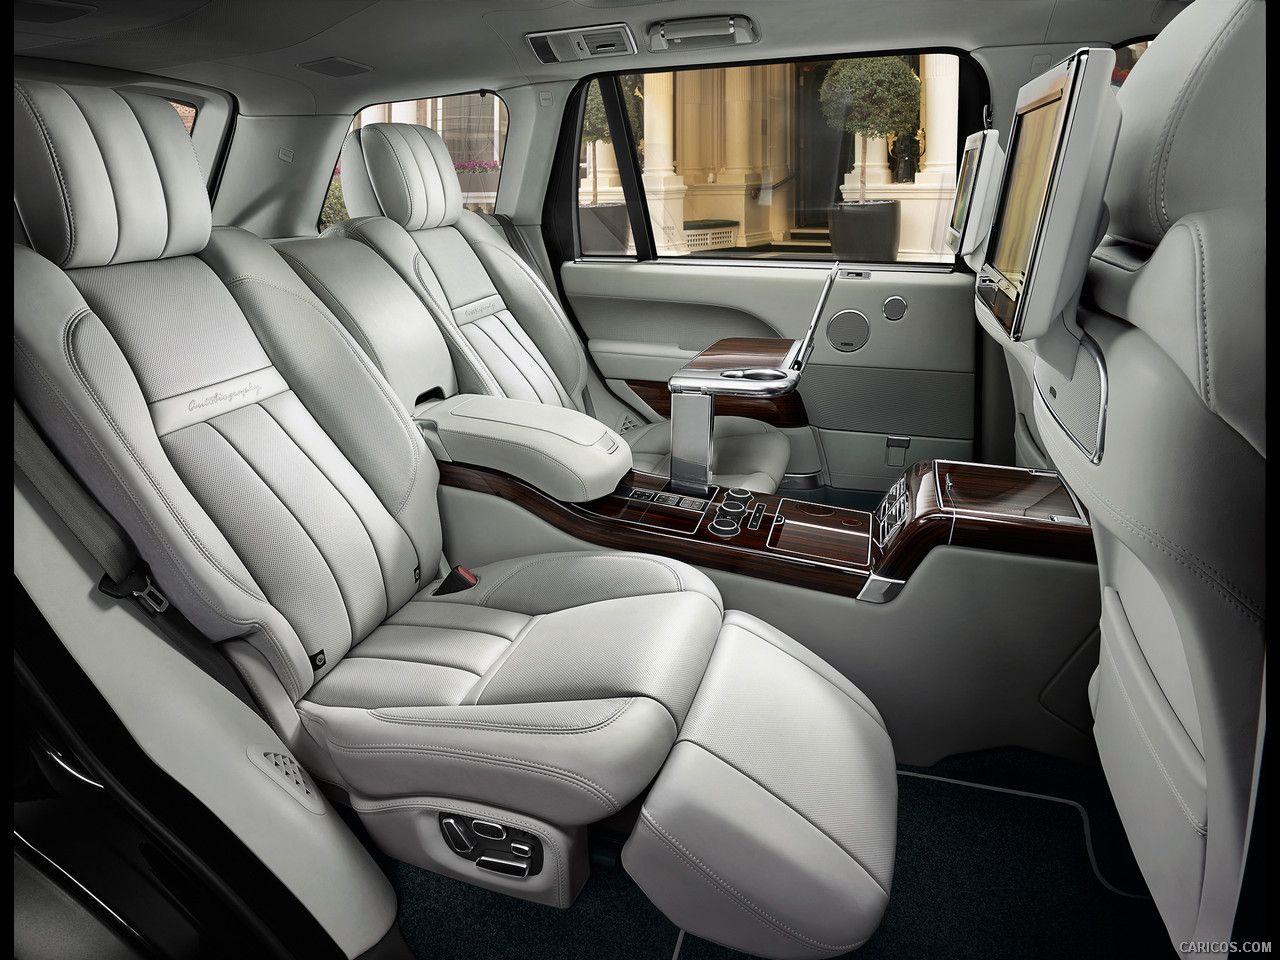 caricos 2016 range rover sv autobiography interior dream